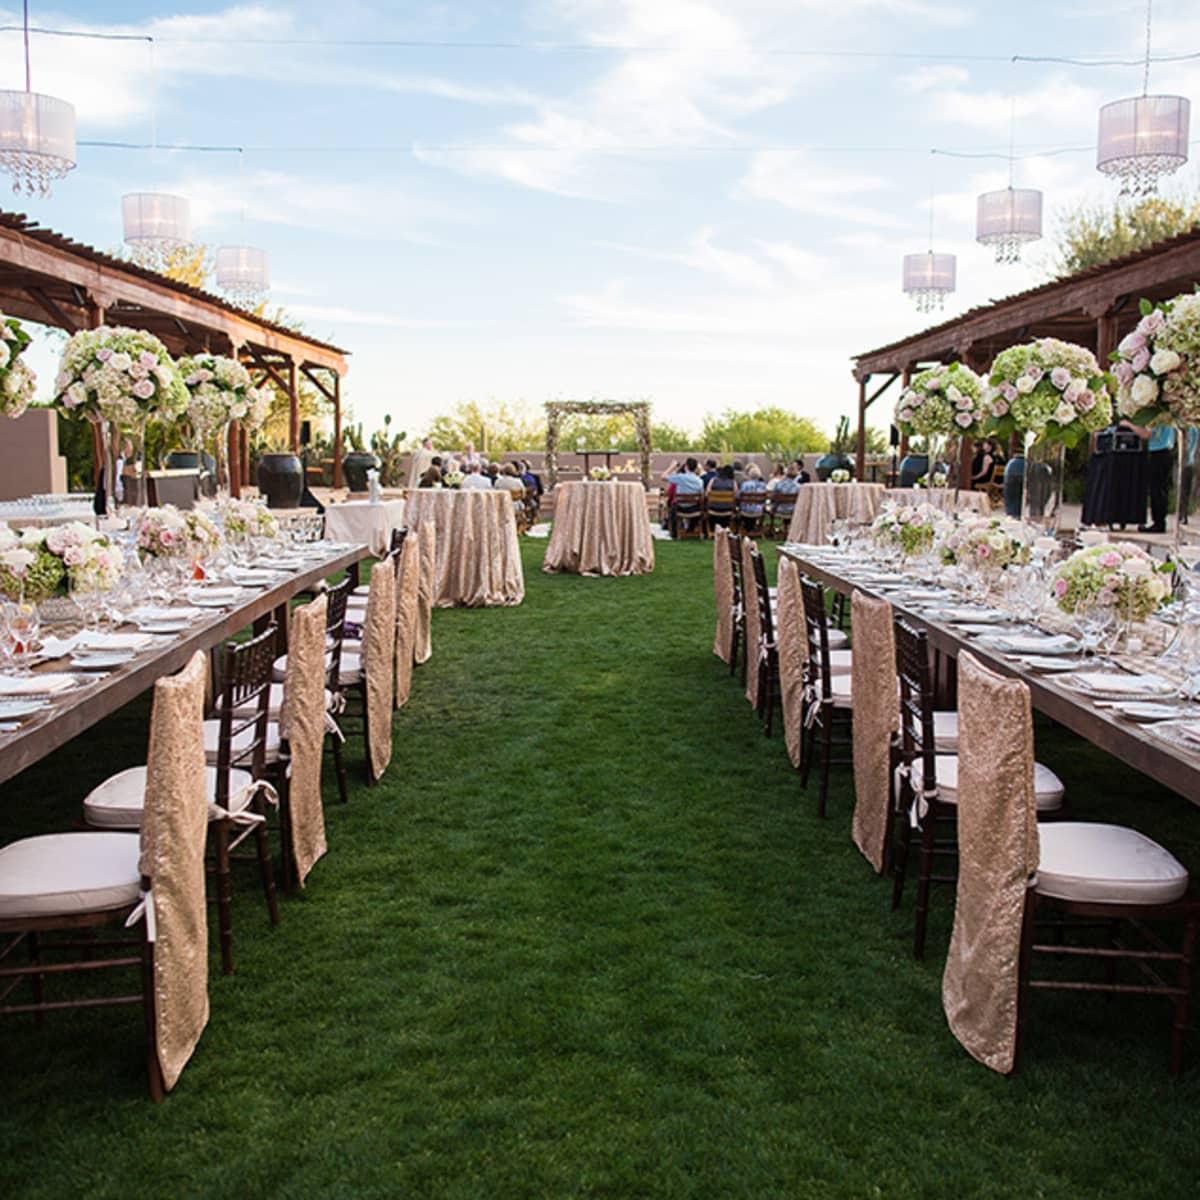 Intimate Wedding Ceremony Ideas - Wedding Ideas